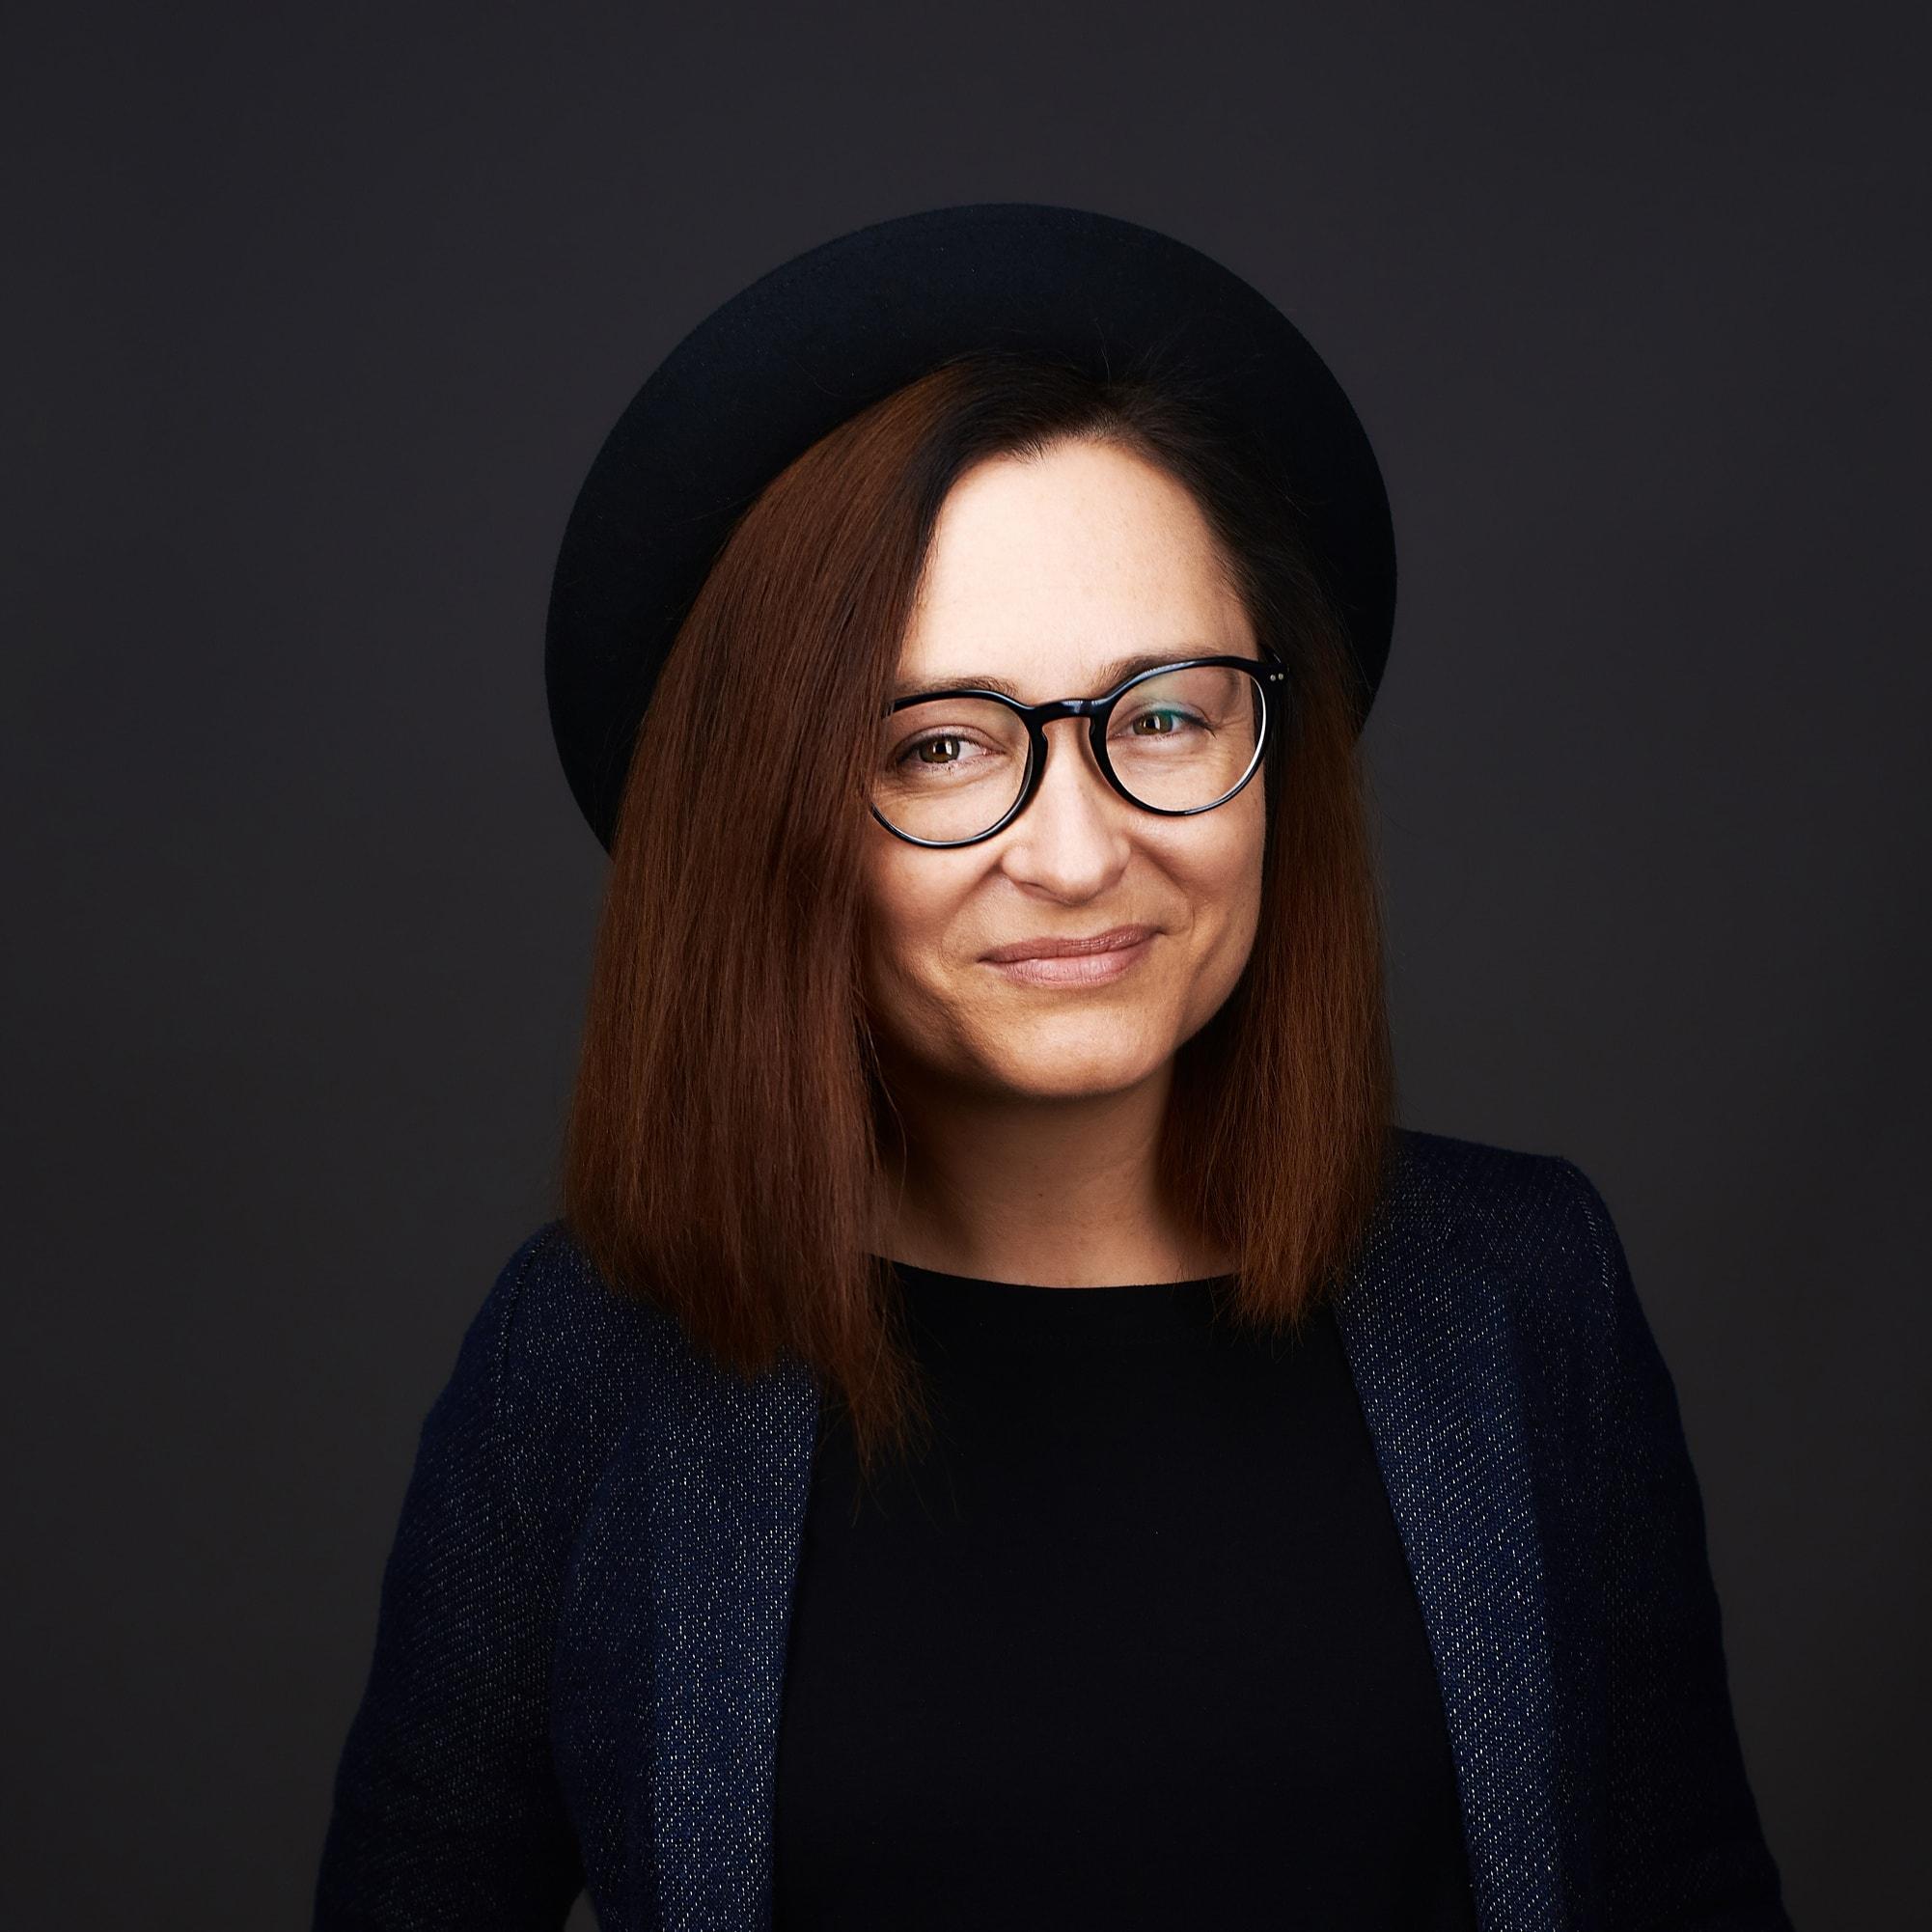 Ana Wolsztajn